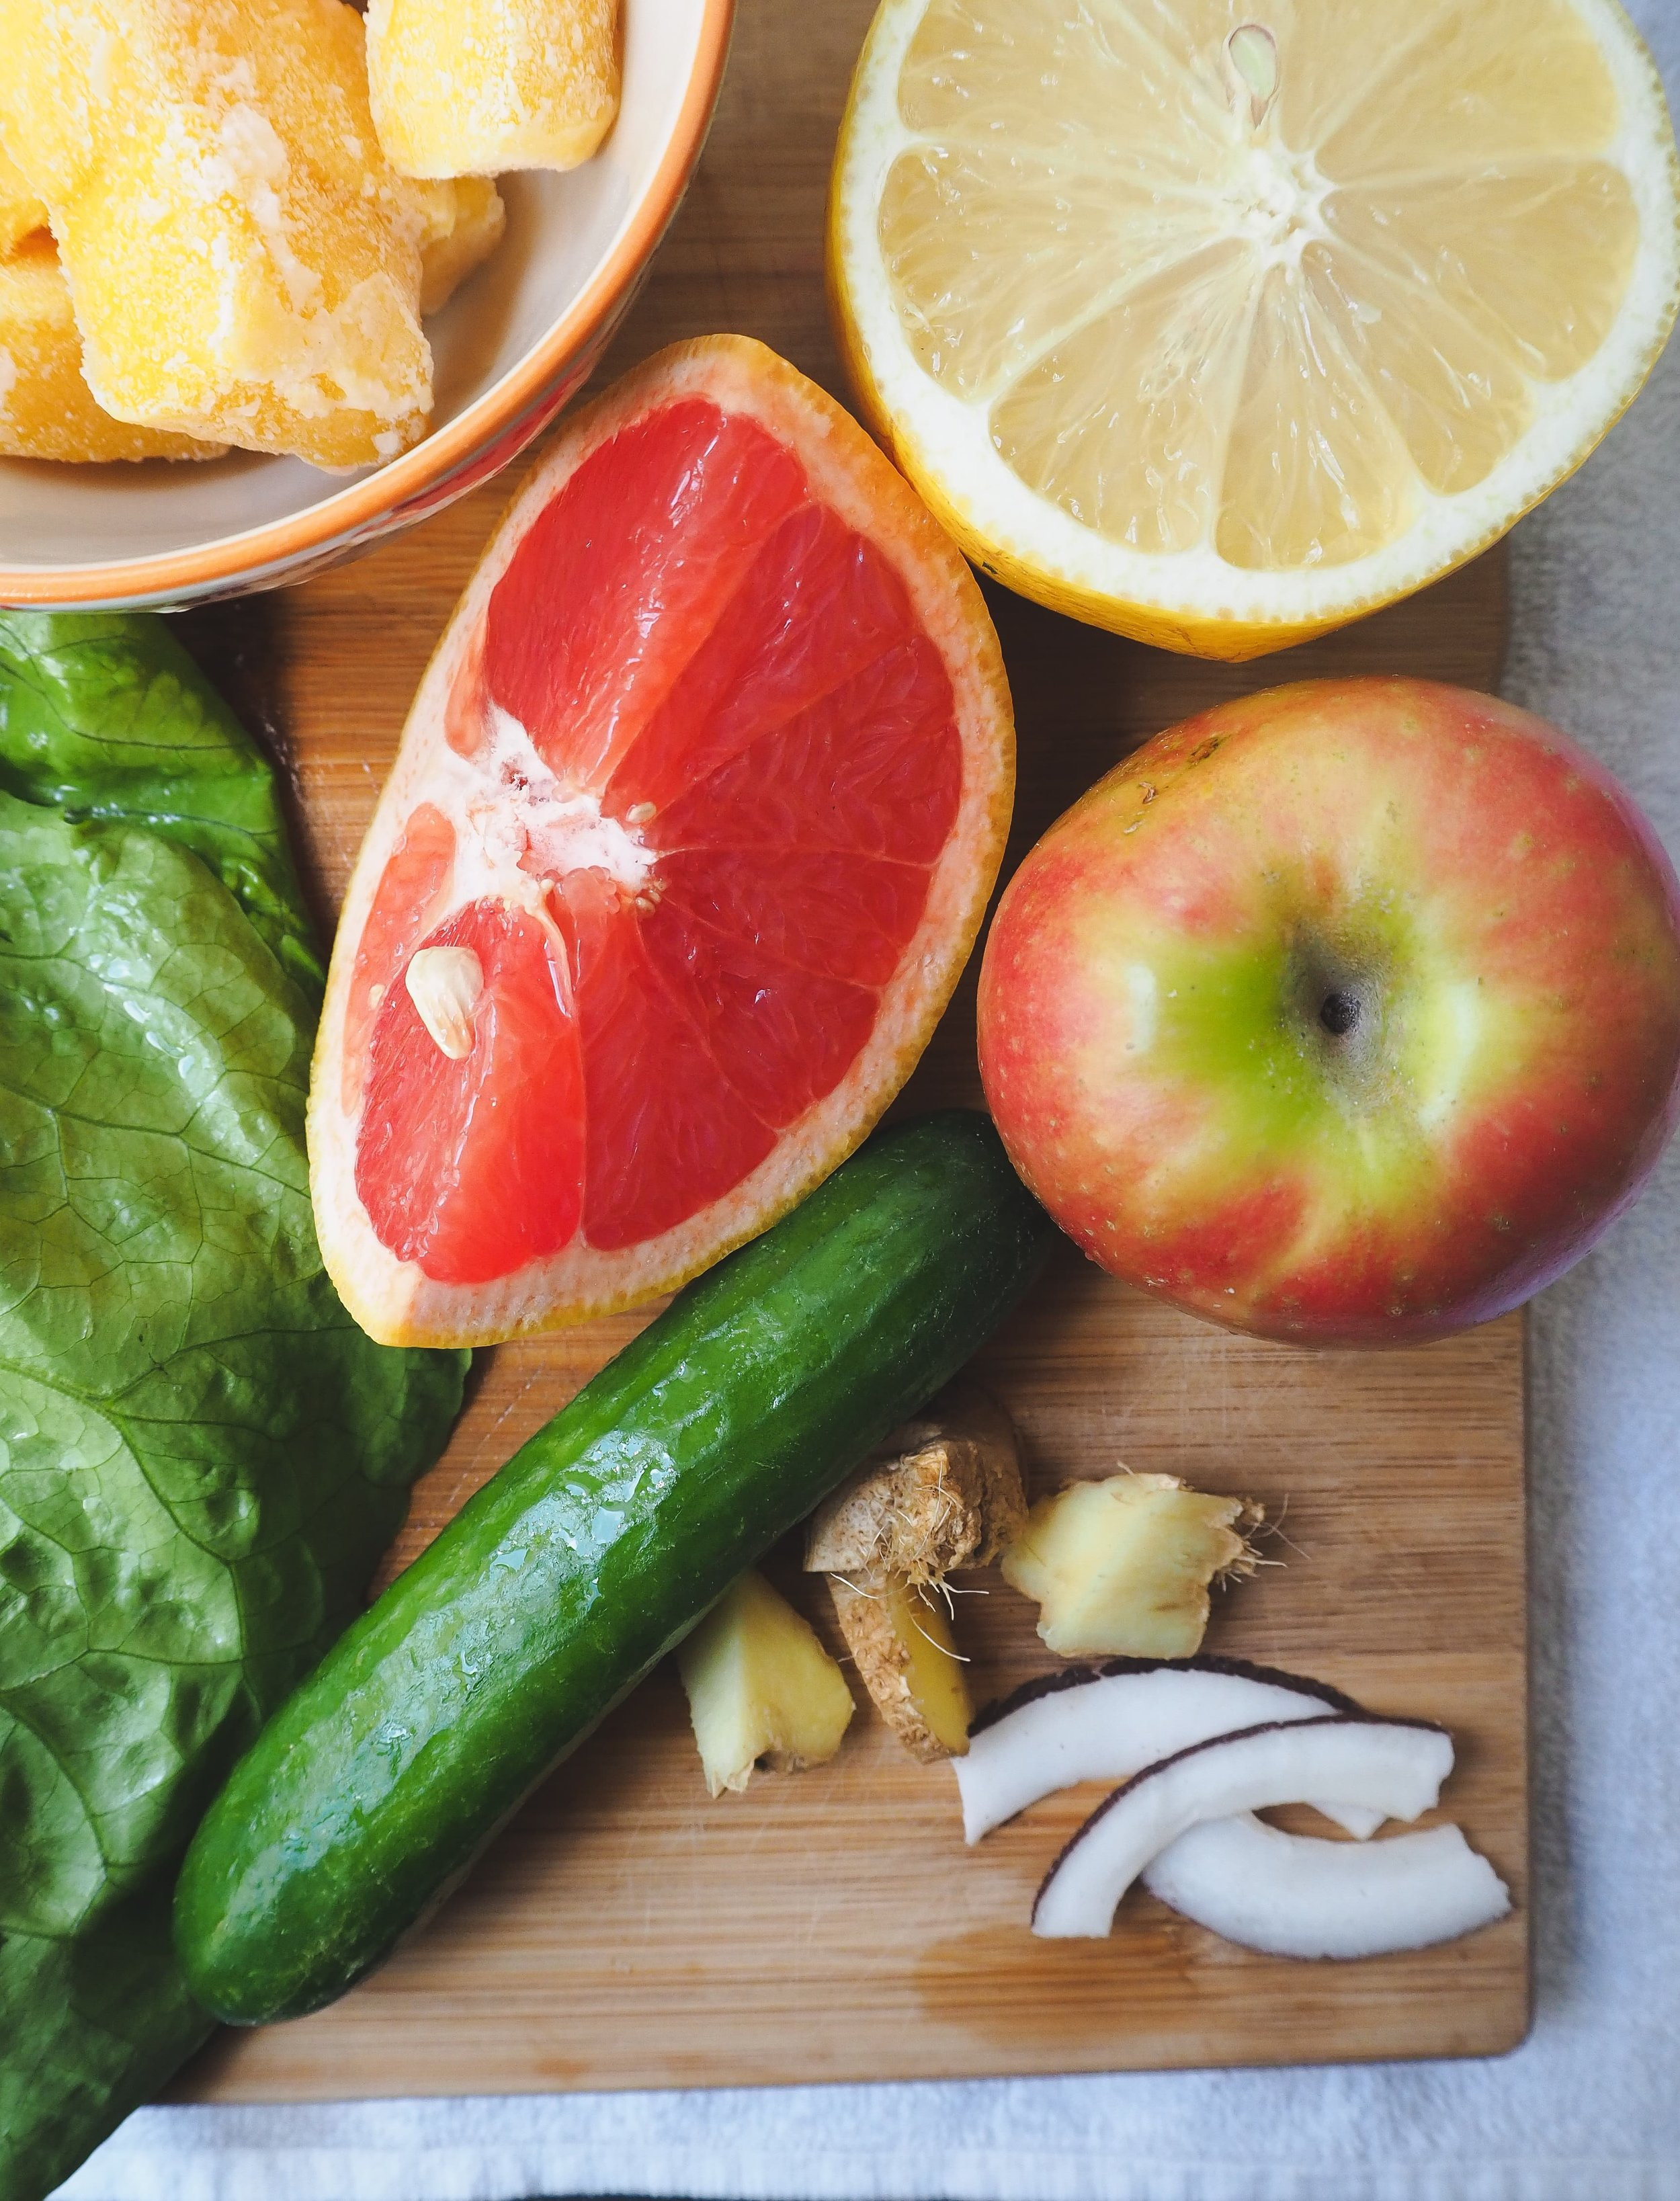 Healthy-Green-Smoothie-Ingredients